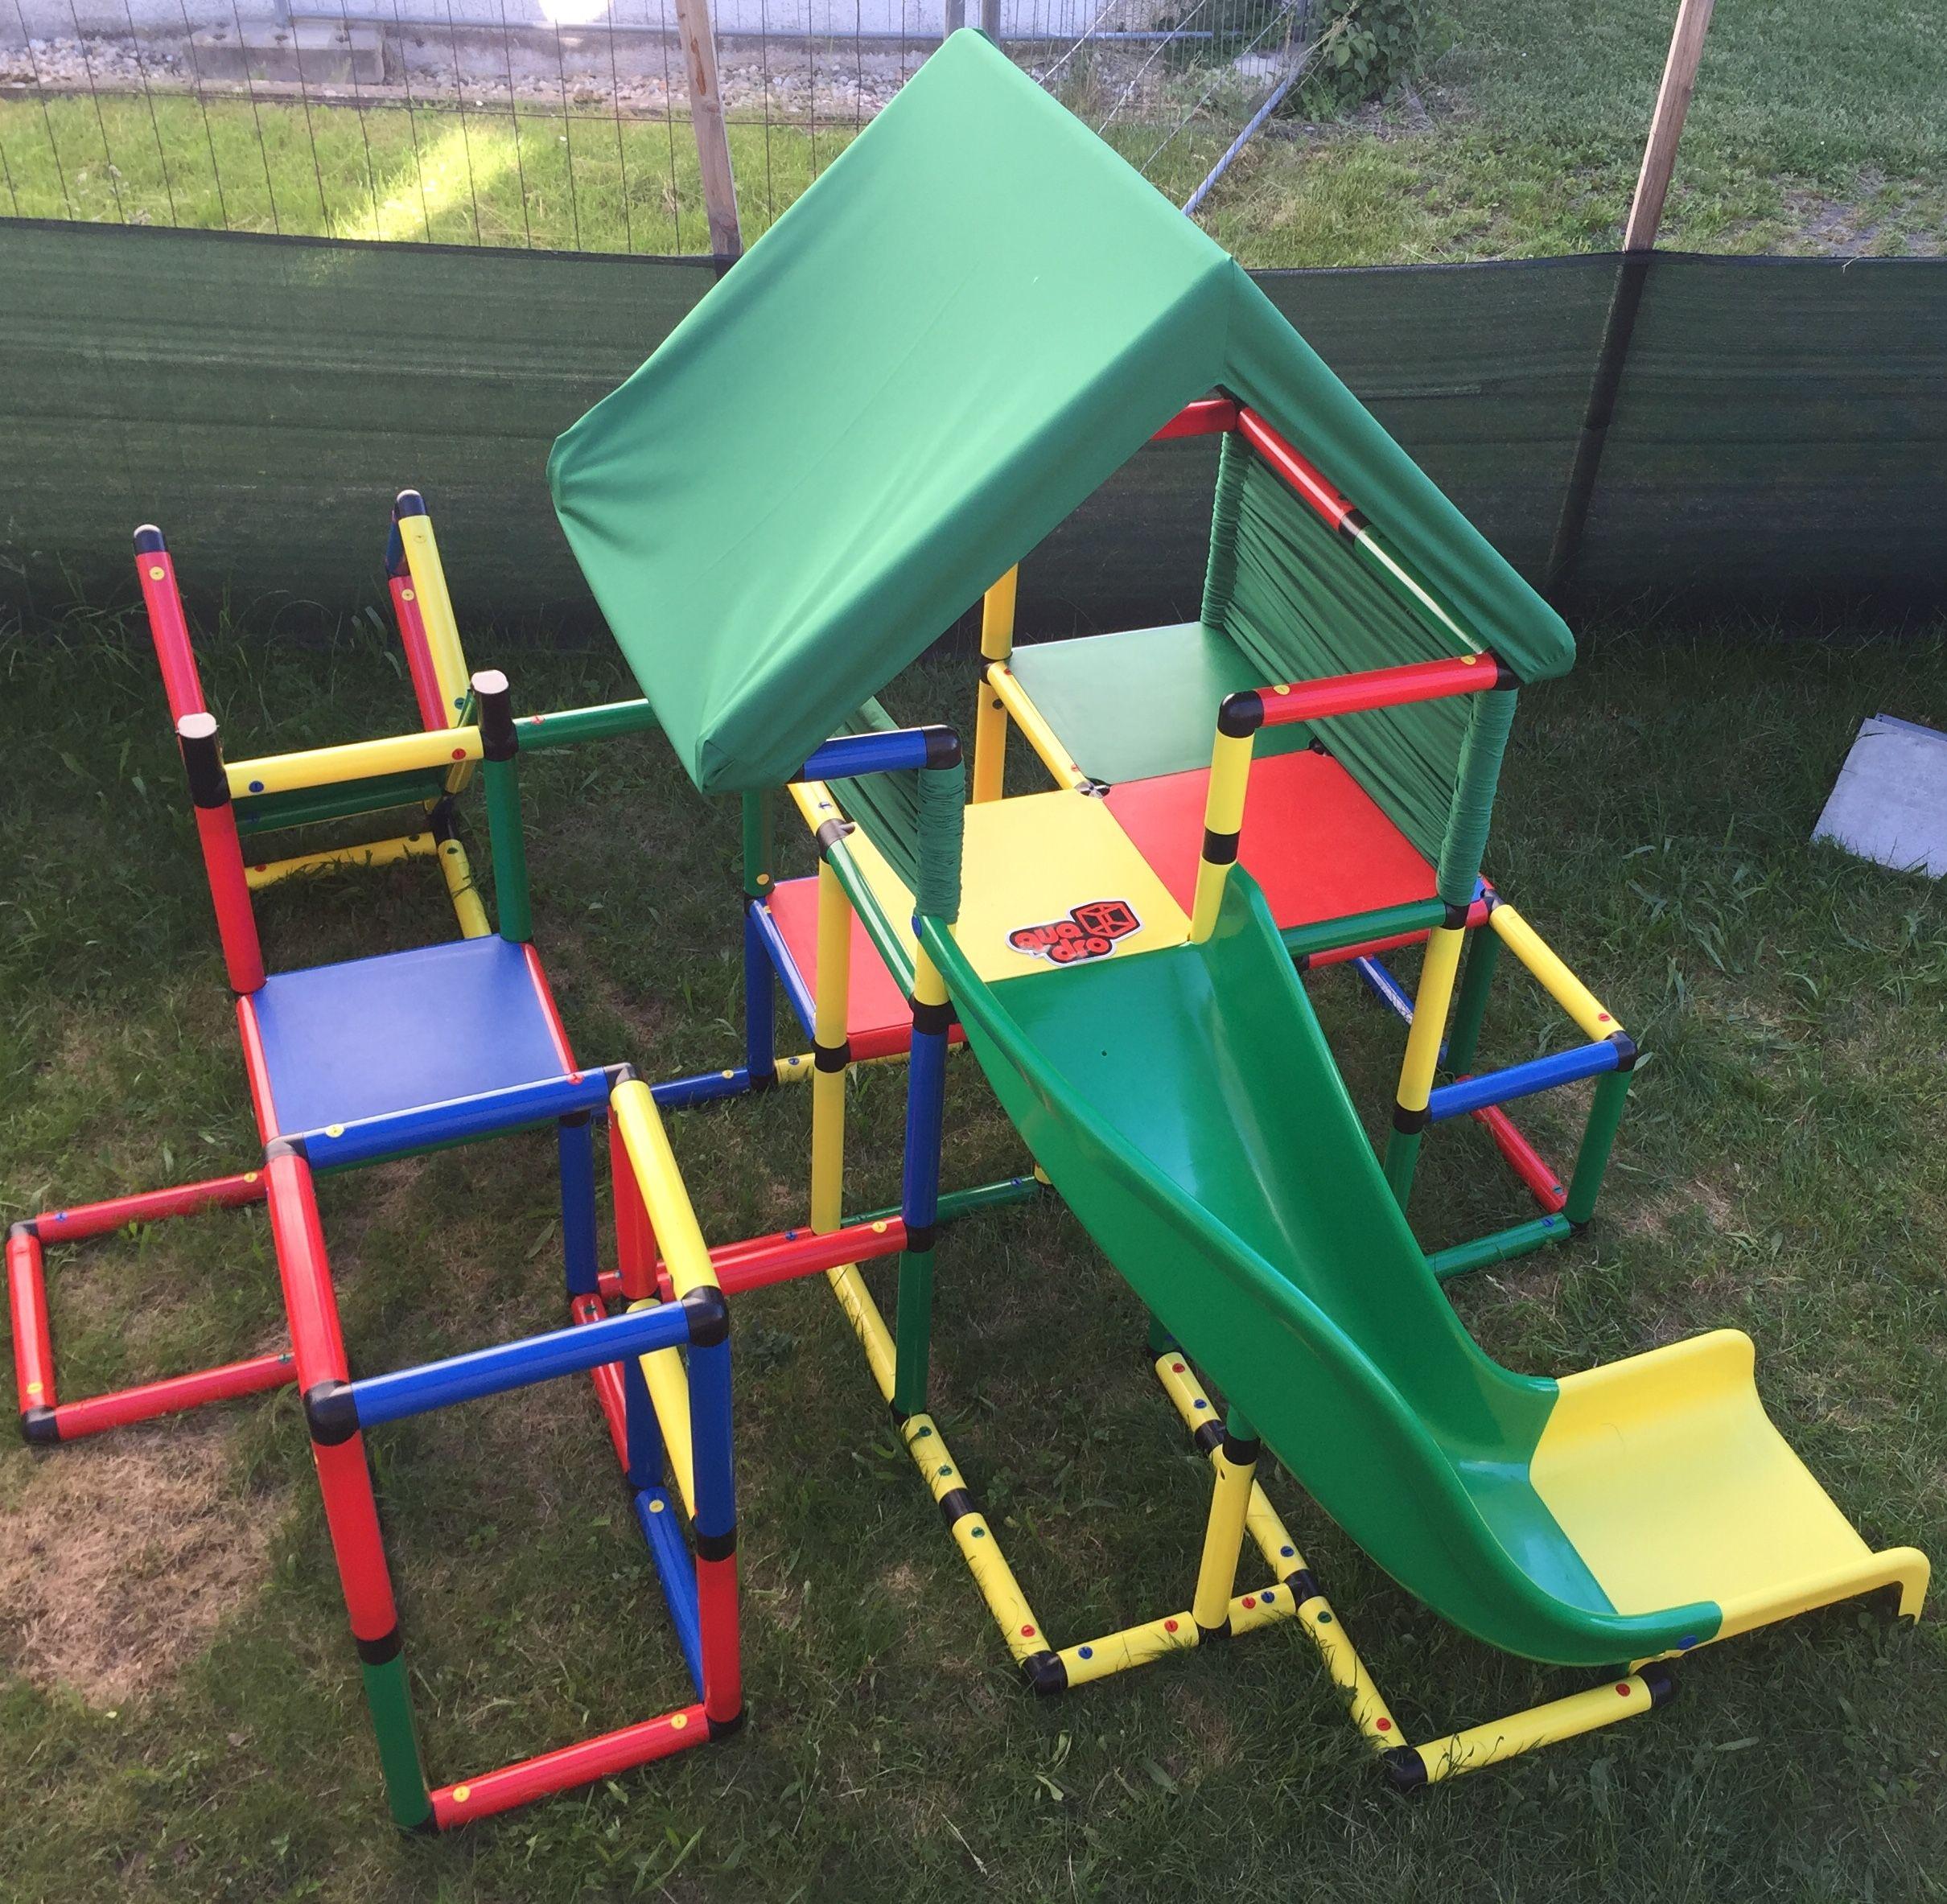 Quadro Quadro Klettergerust Klettergerust Spielturm